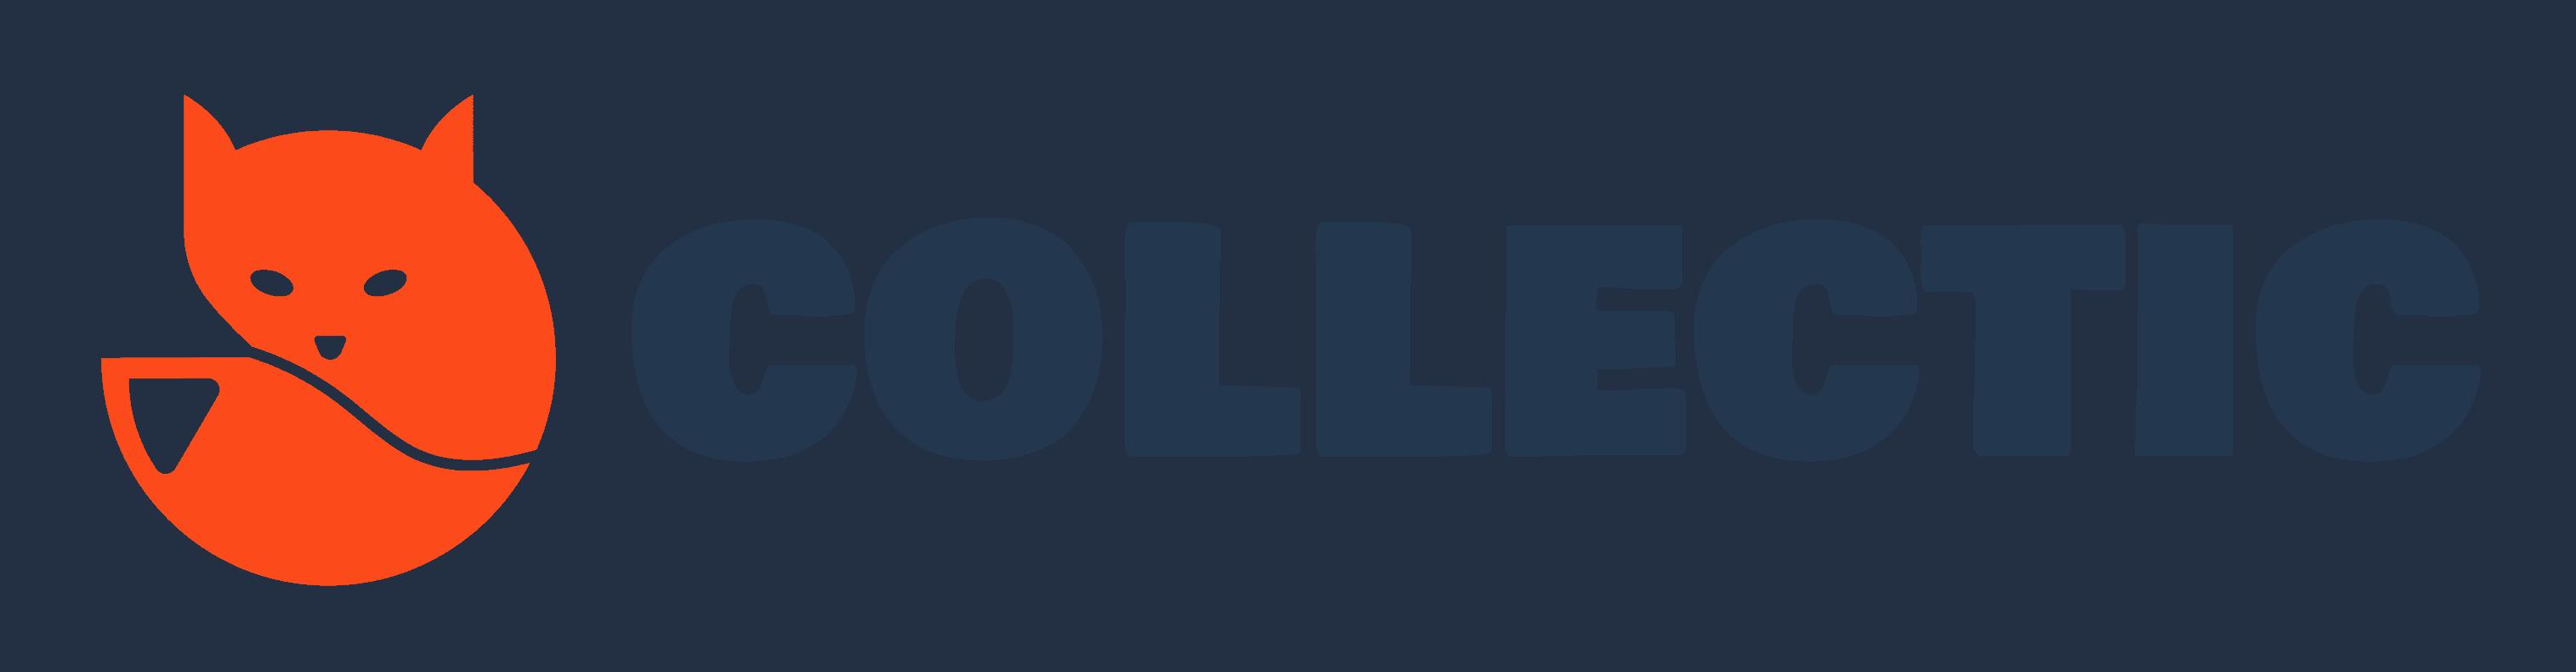 startup-logo-maker-a1144 (5)